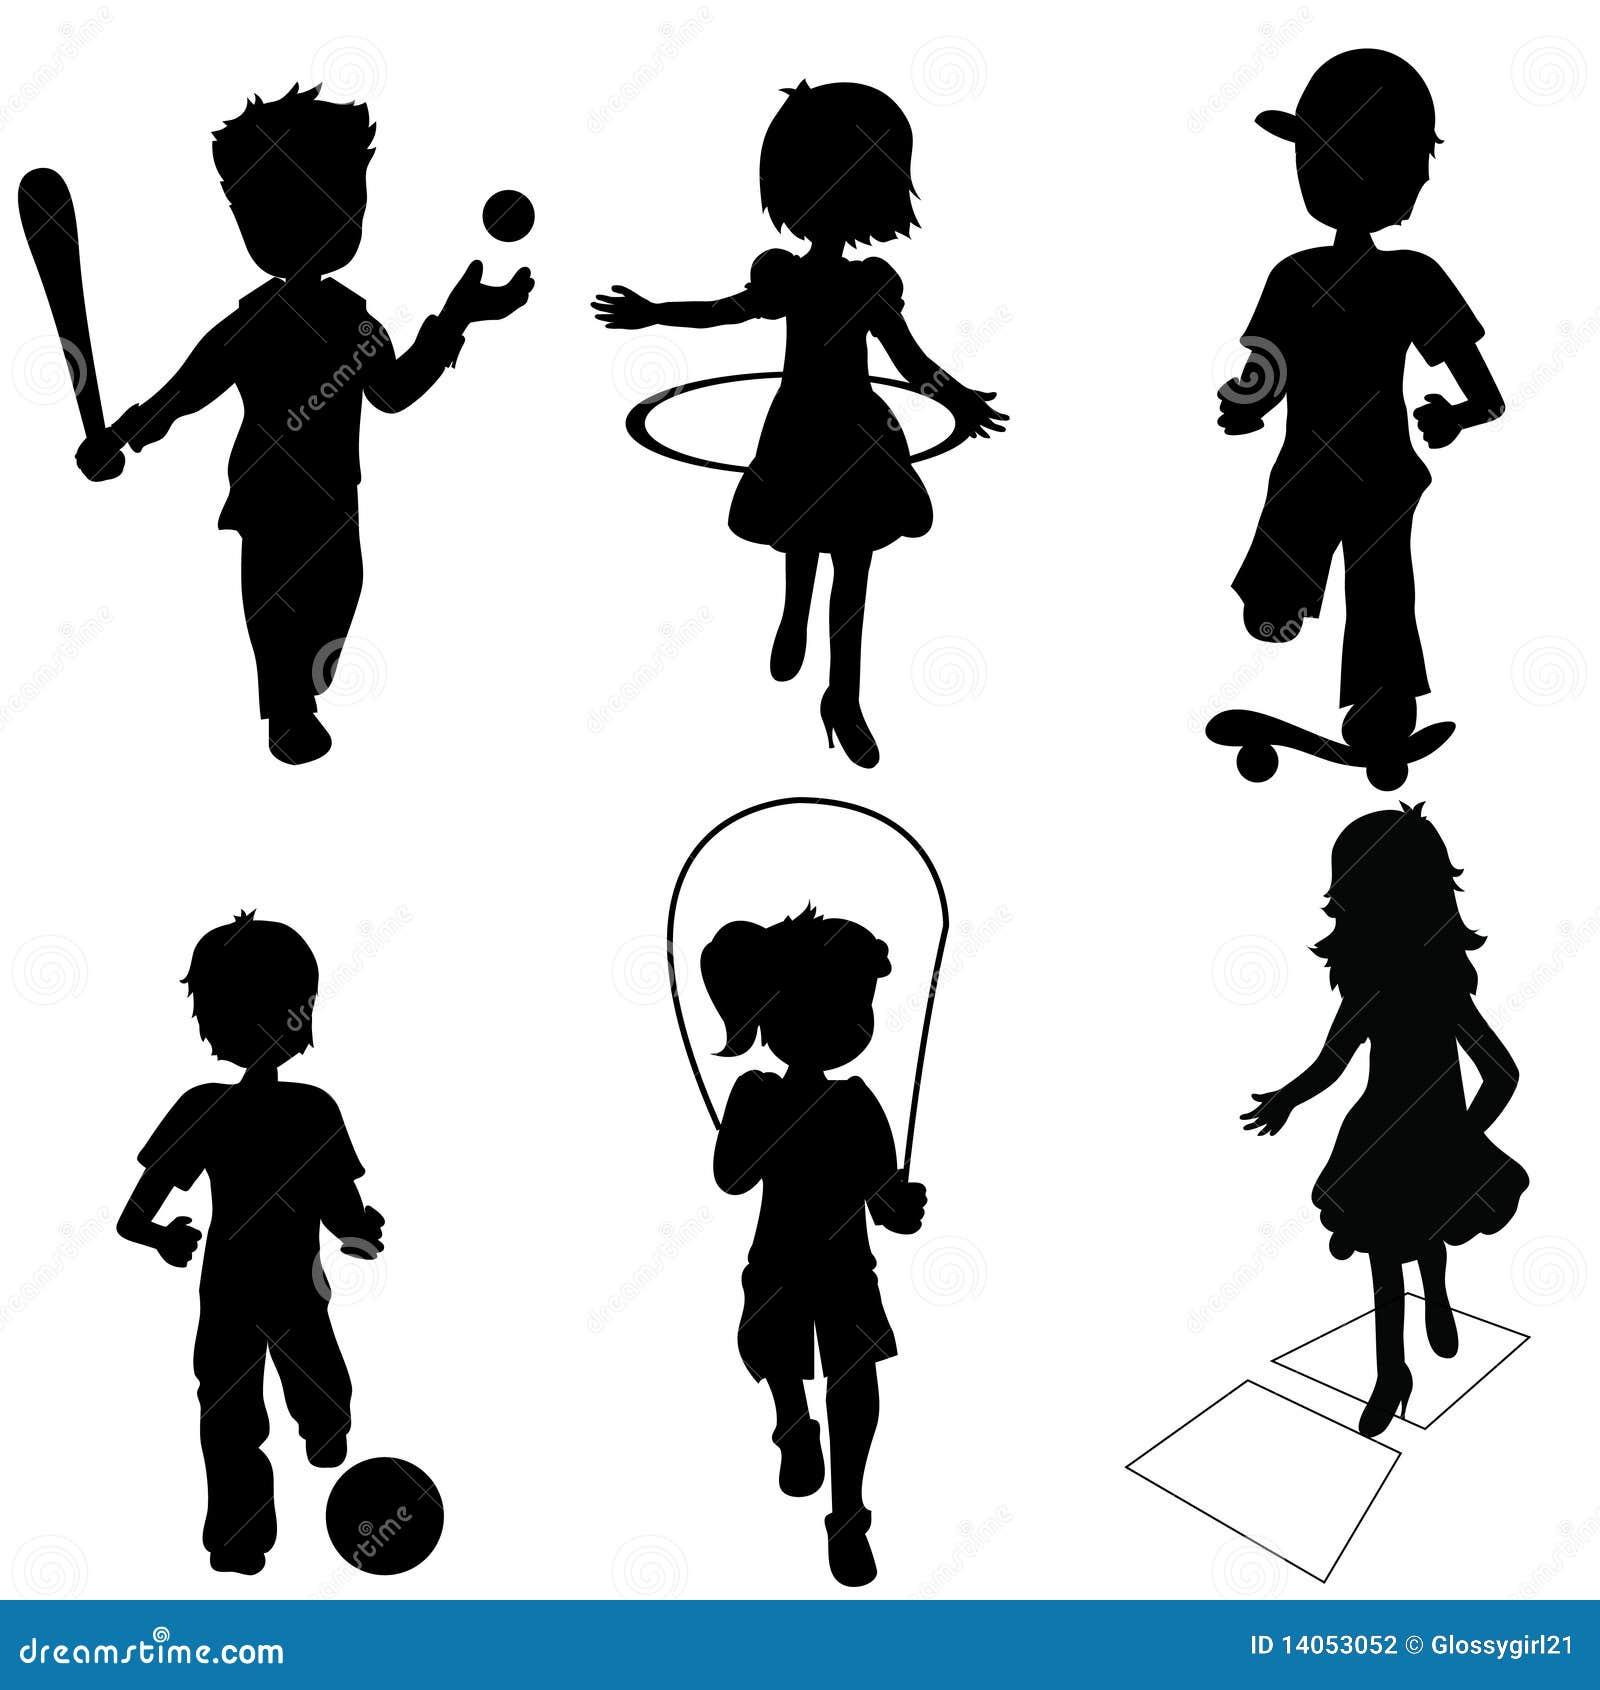 children playing silhouette - photo #25